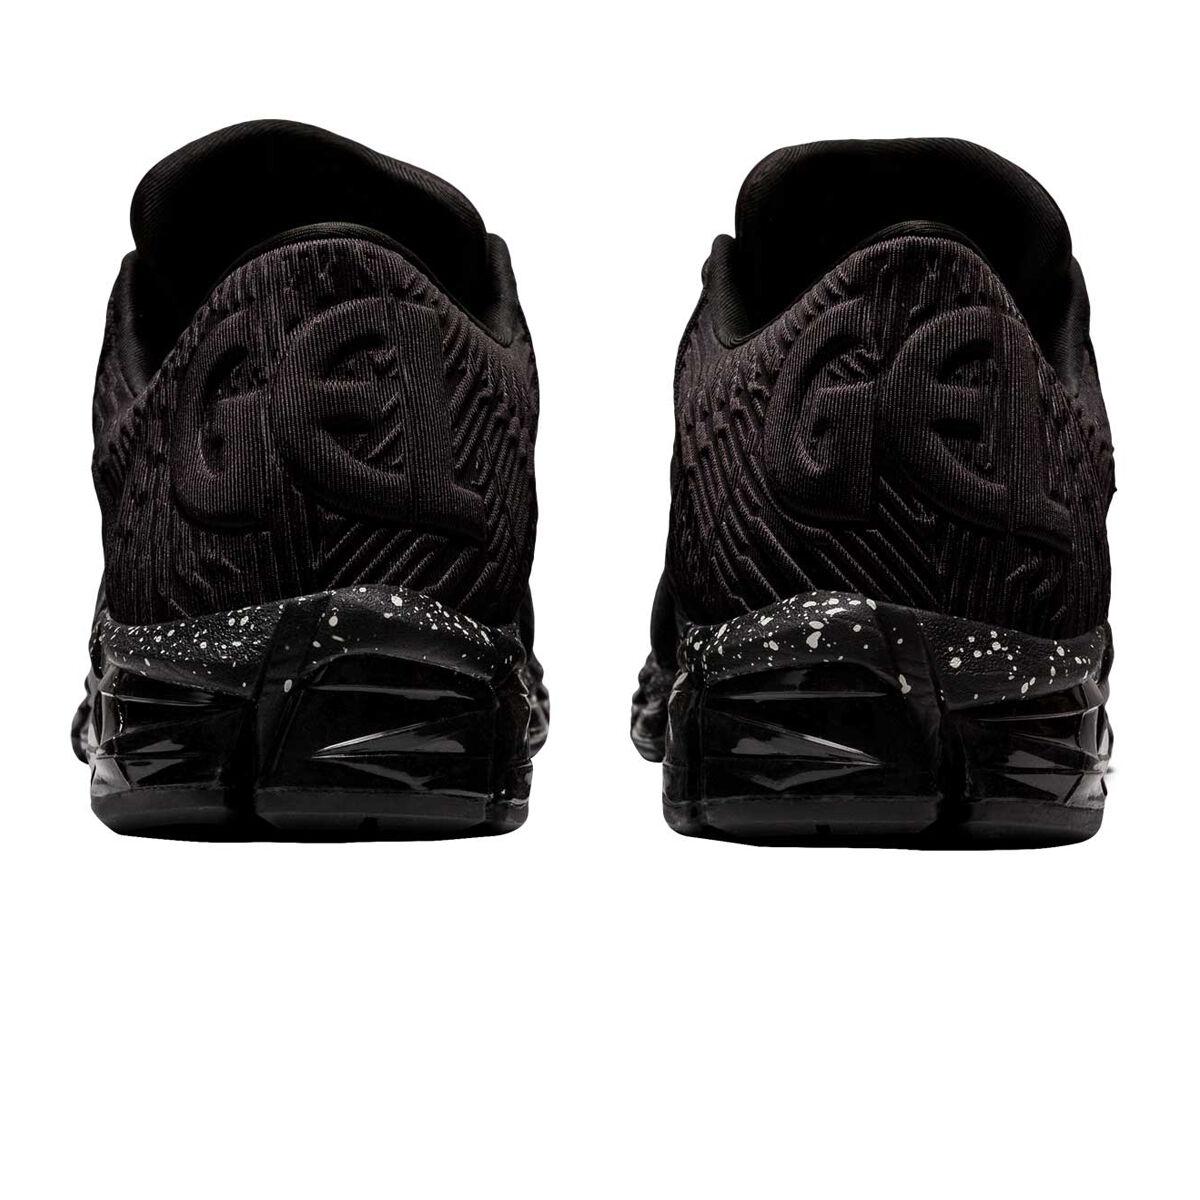 Asics GEL Quantum 360 5 Jacquard Mens Training Shoes